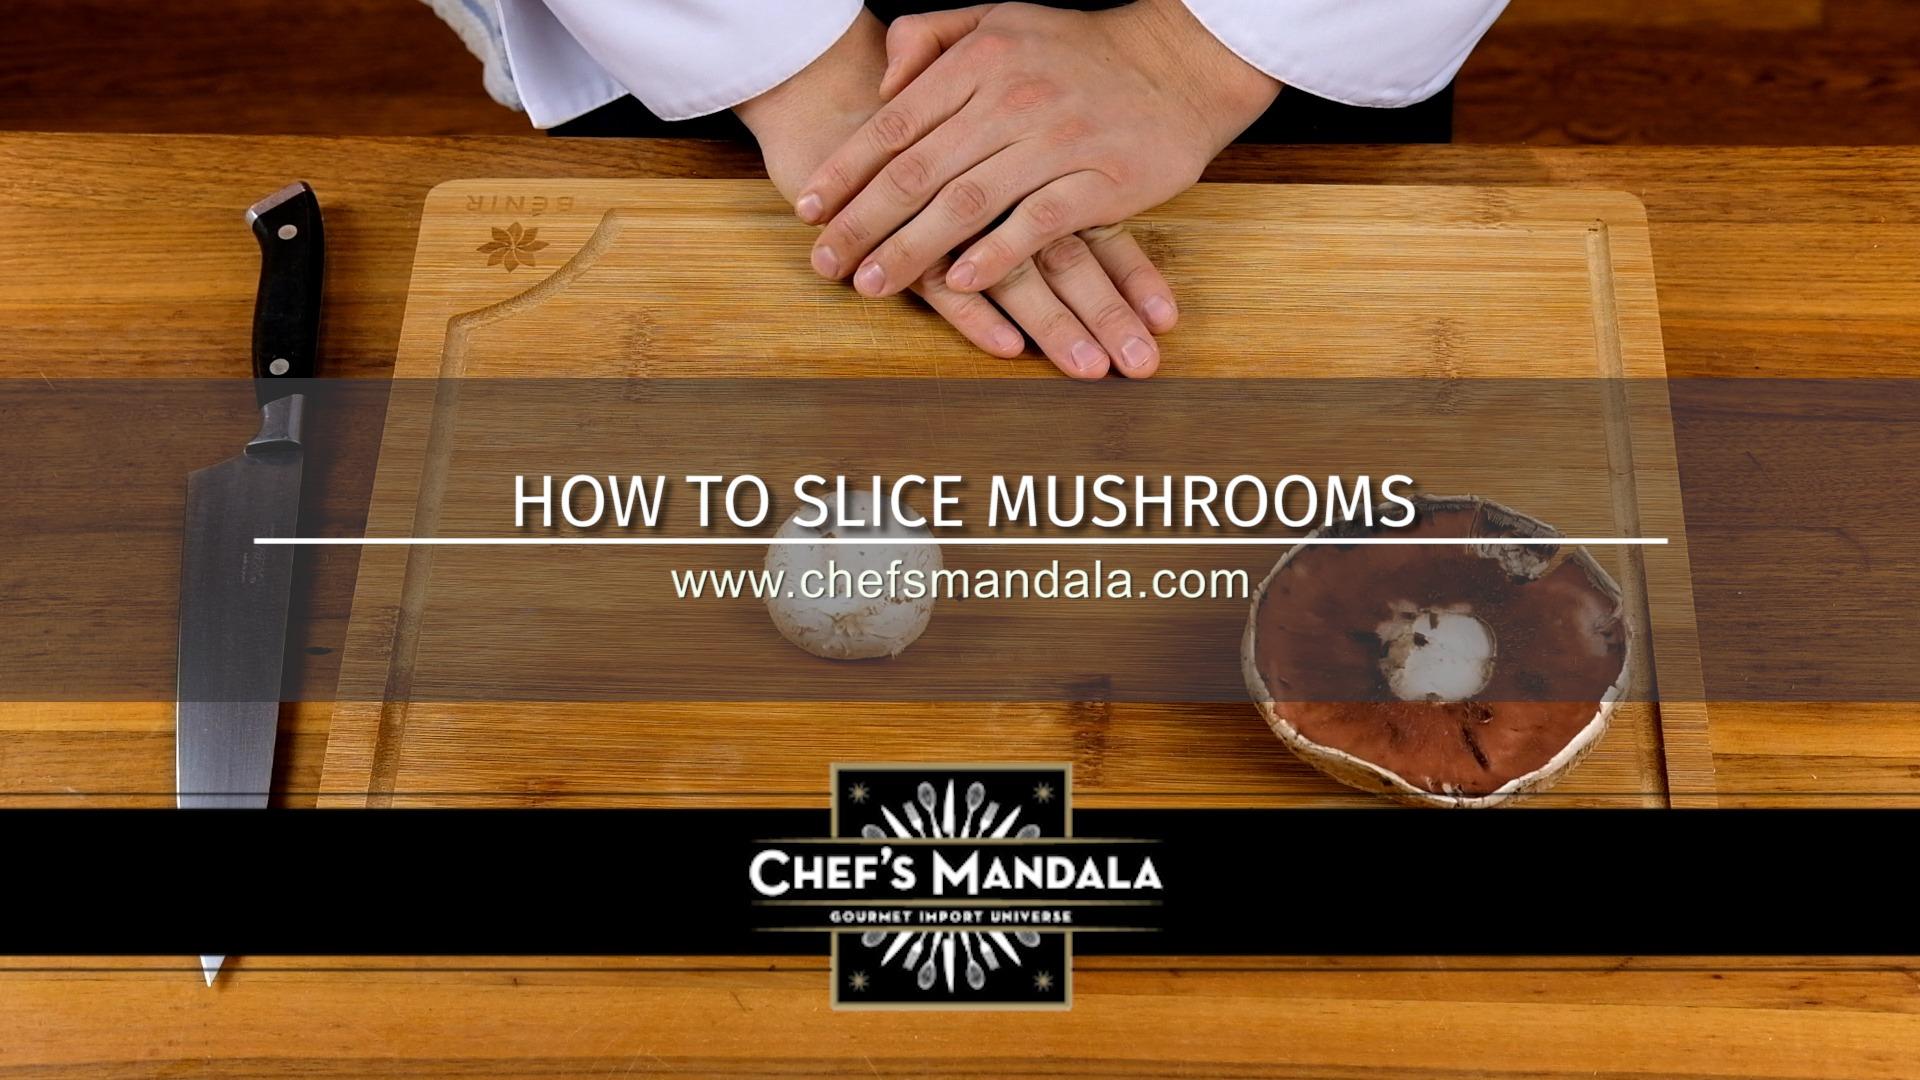 HOW TO SLICE MUSHROOMS